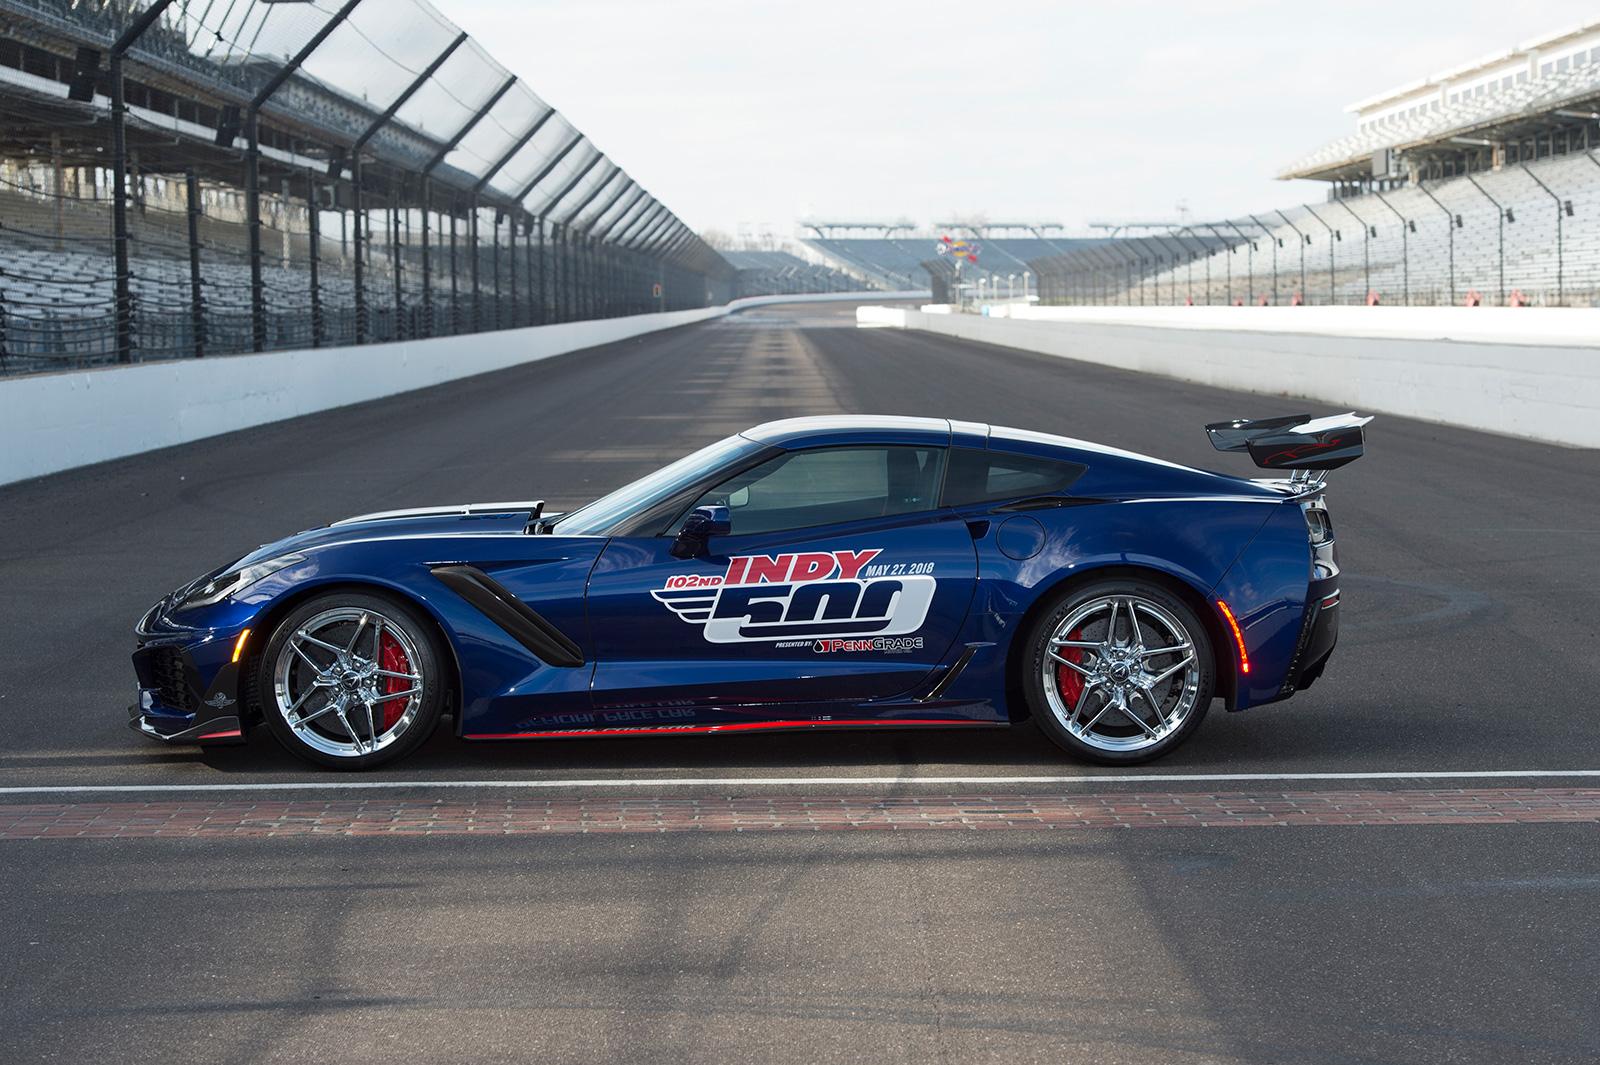 New 2019 Corvette Zr1 >> 2019 Chevrolet Corvette ZR1 Named Indy 500 Pace Car - GM Inside News